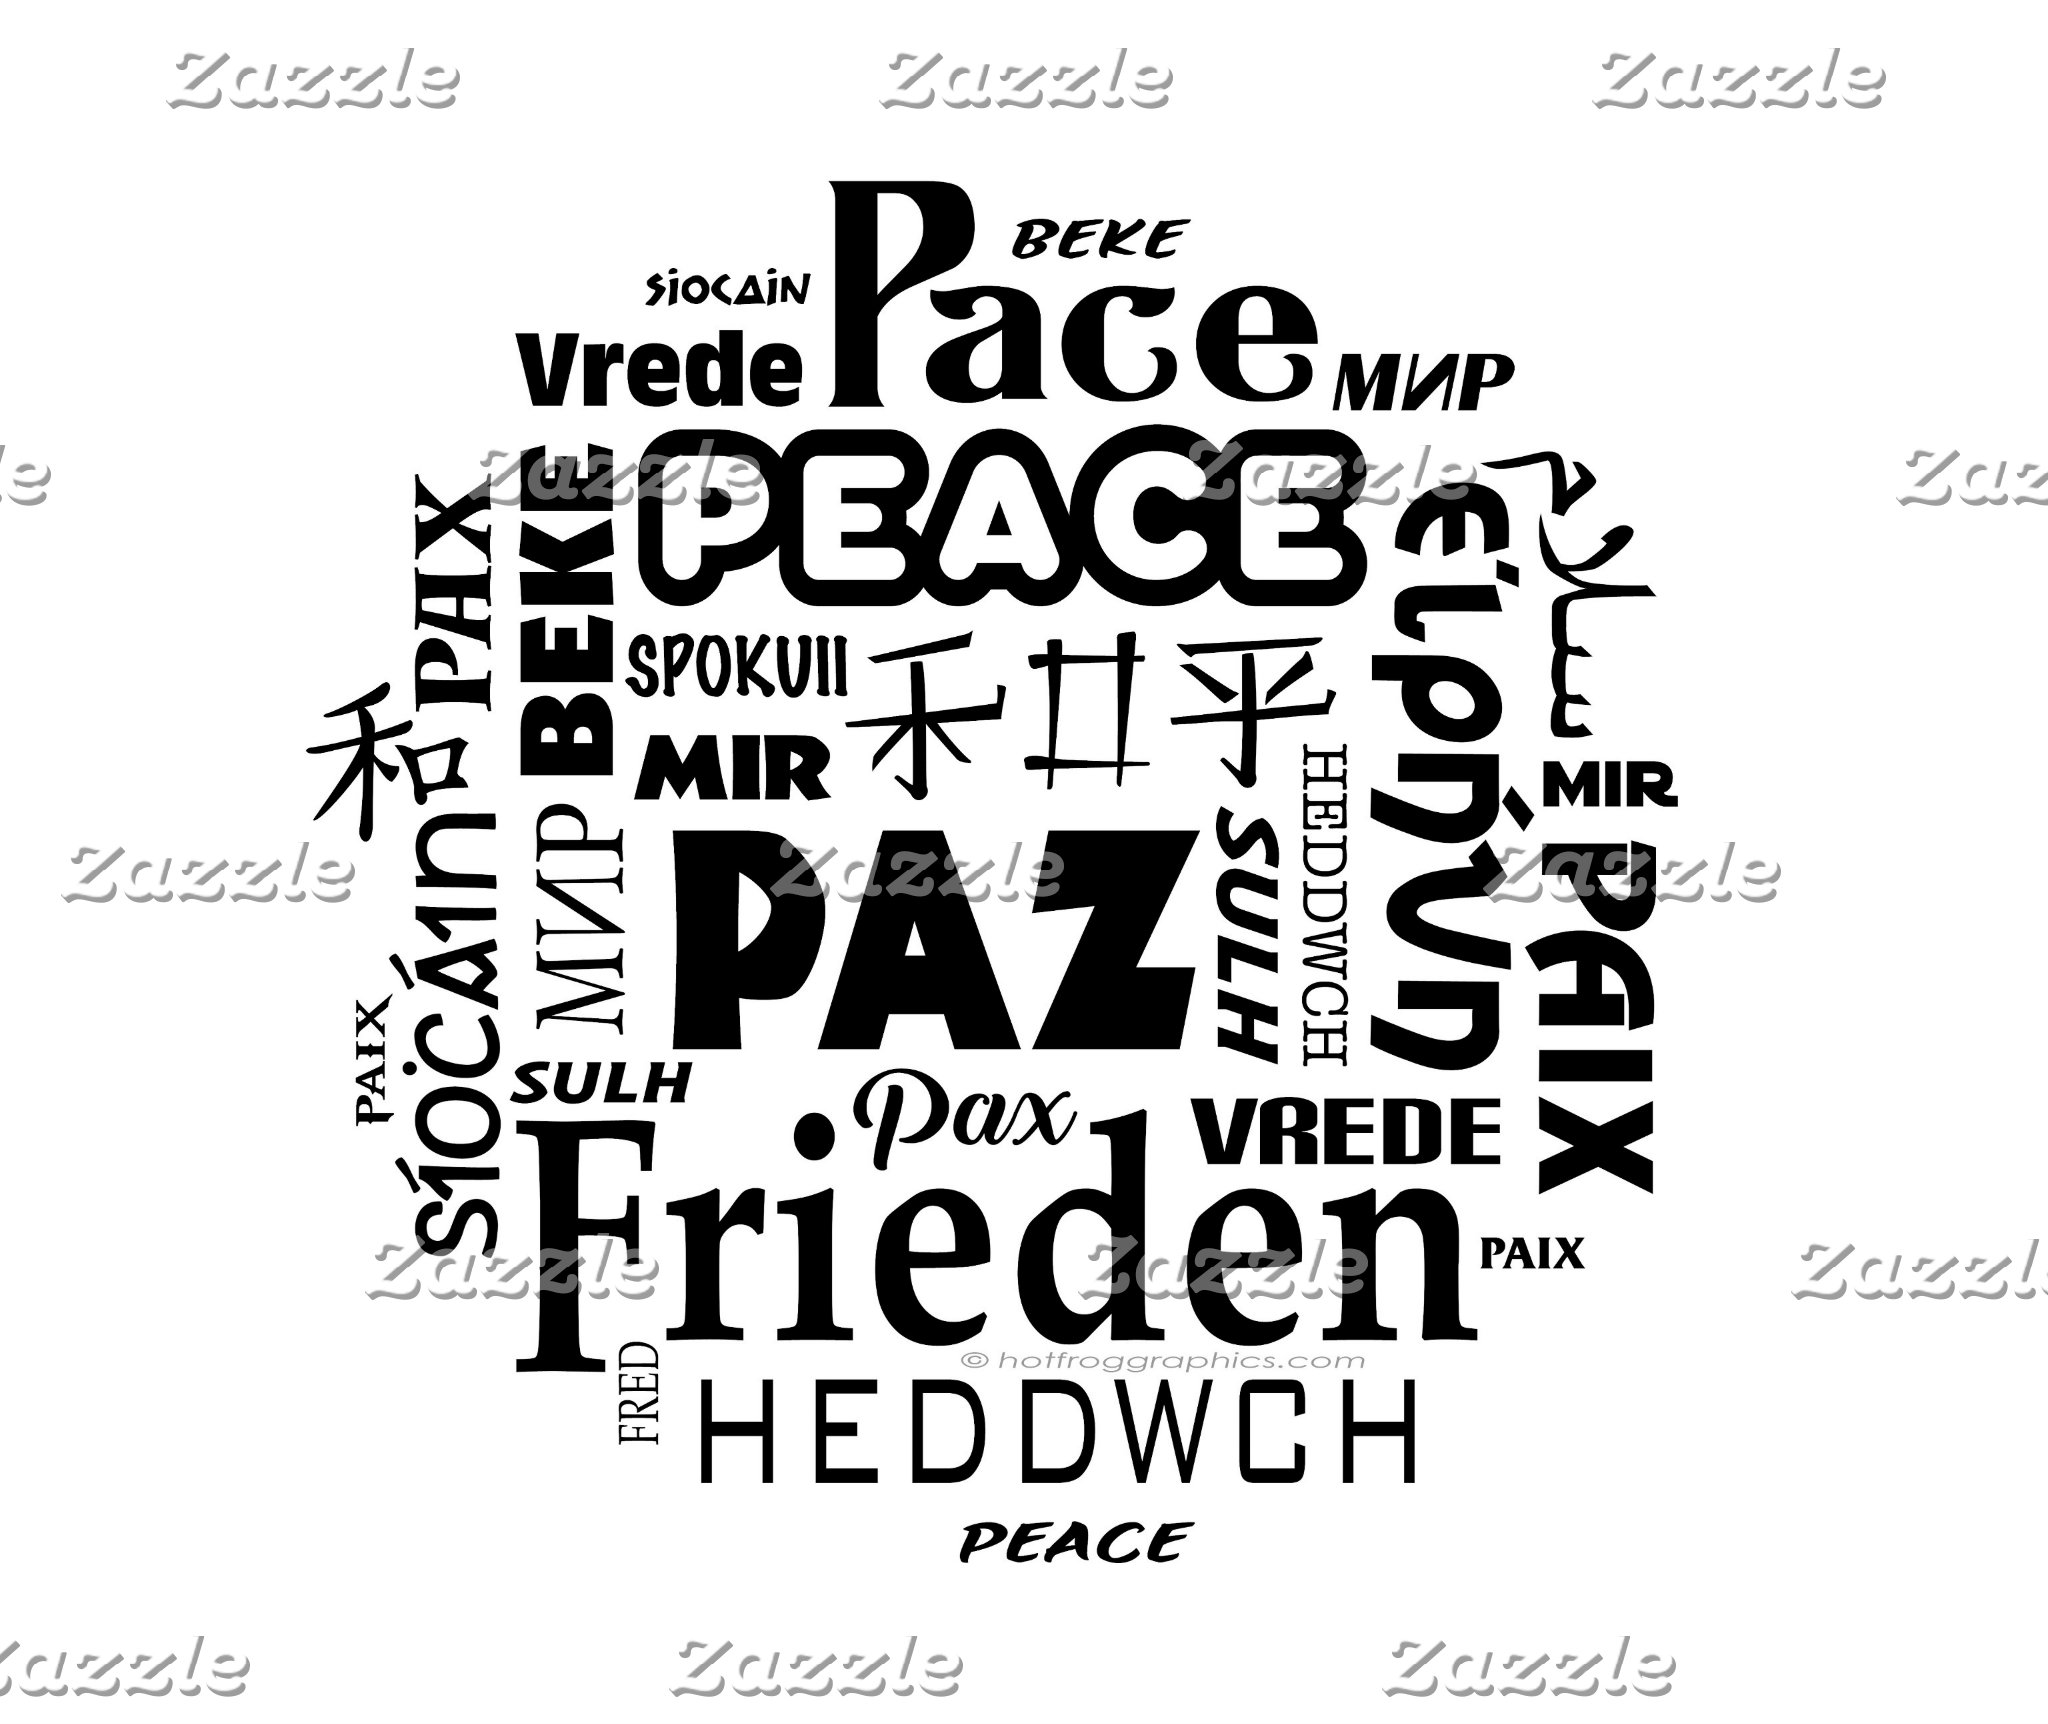 Multilingual Peace designs